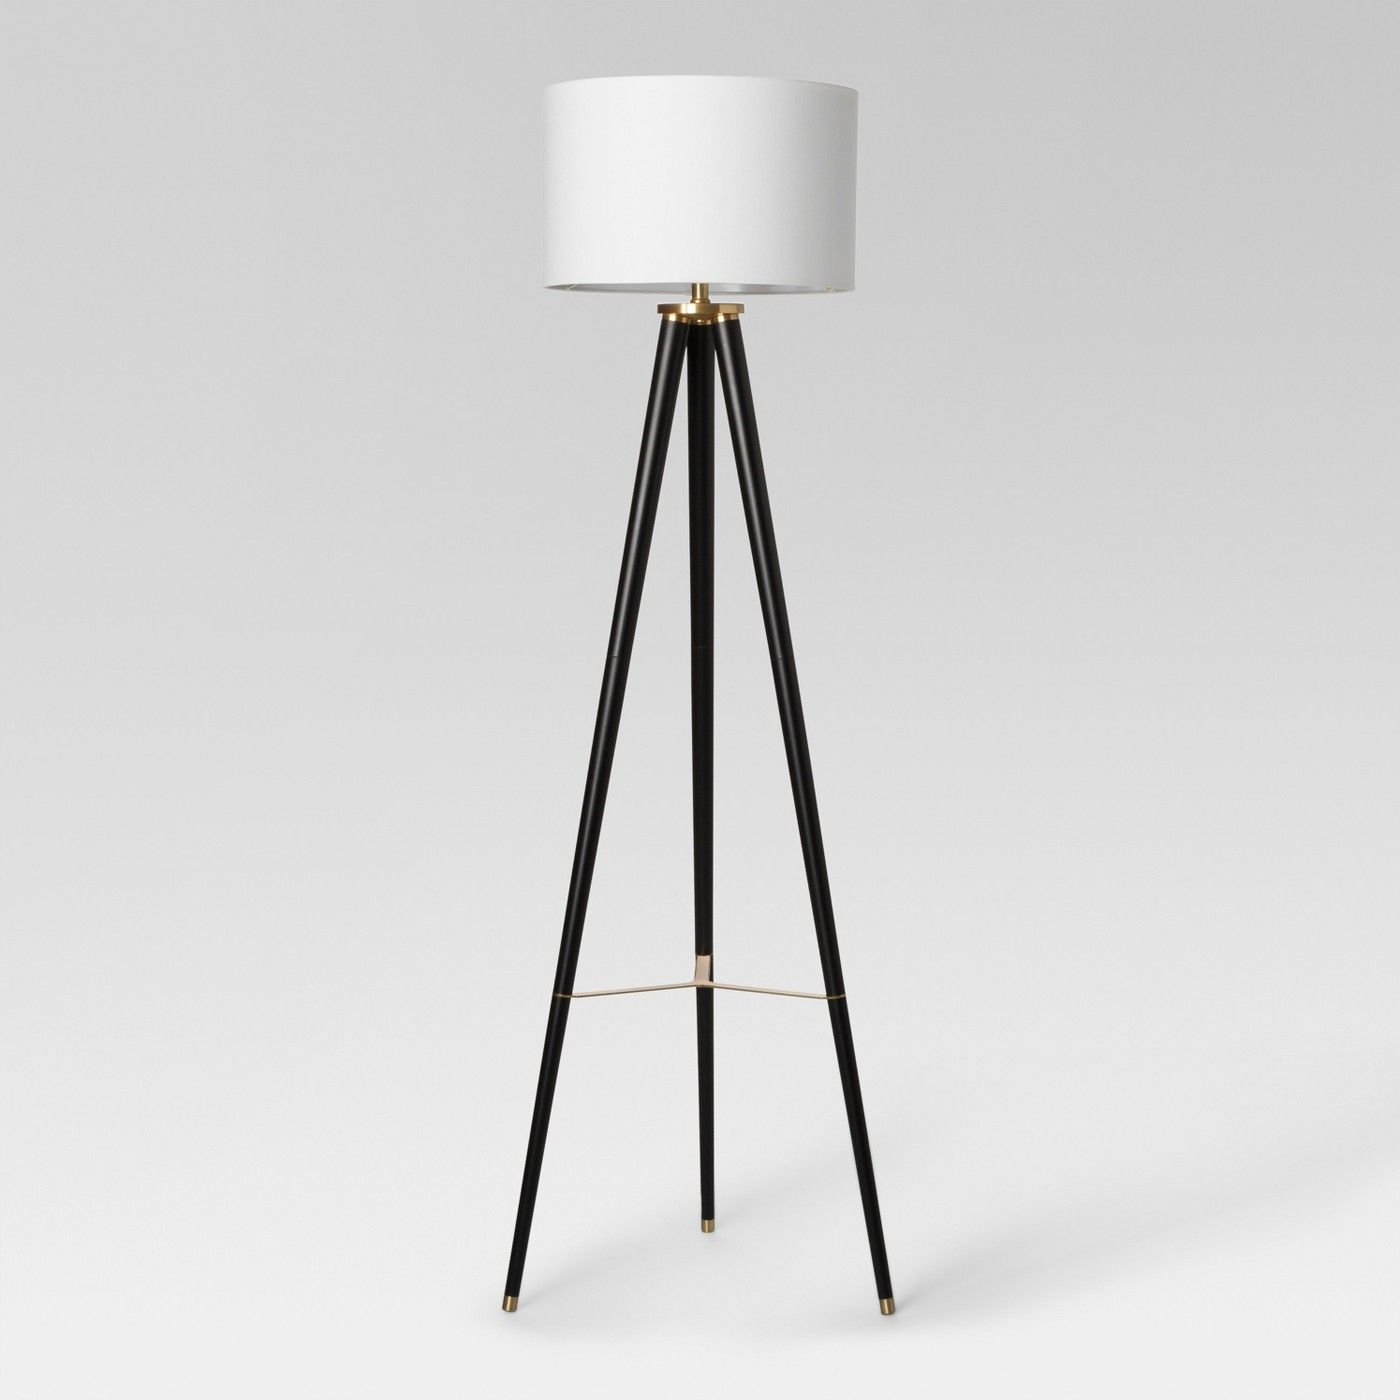 Delavan Tripod Floor Lamp Black Project 62™ Black